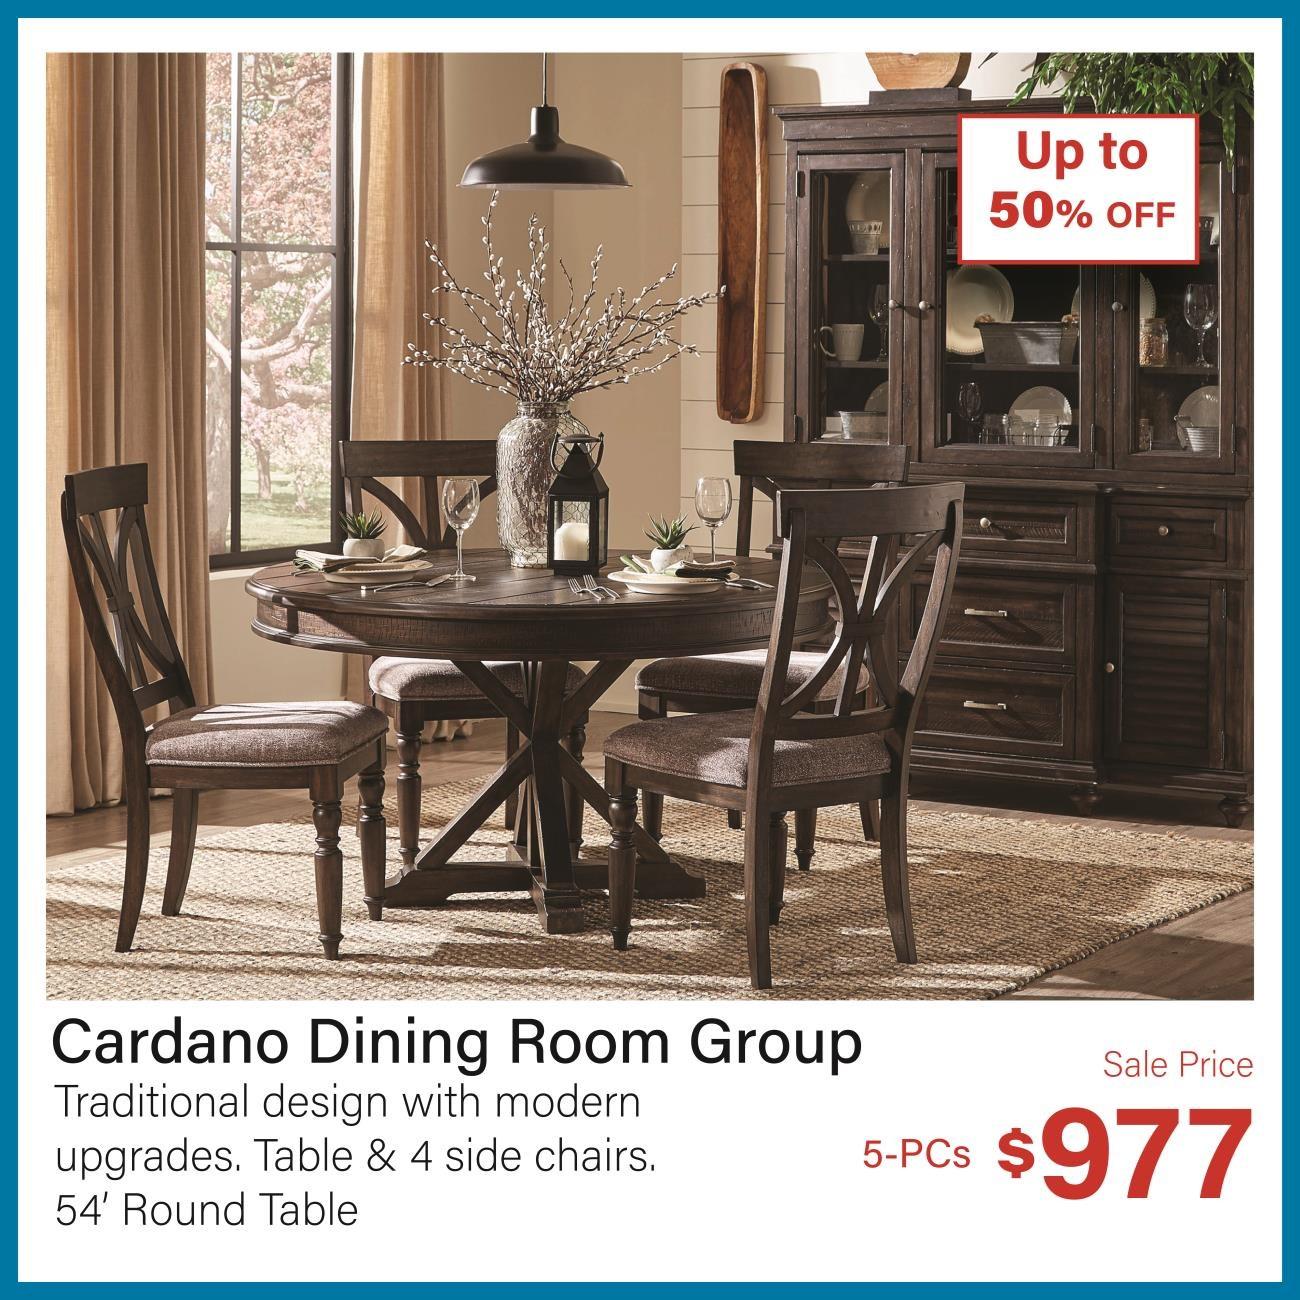 cardano dining room group